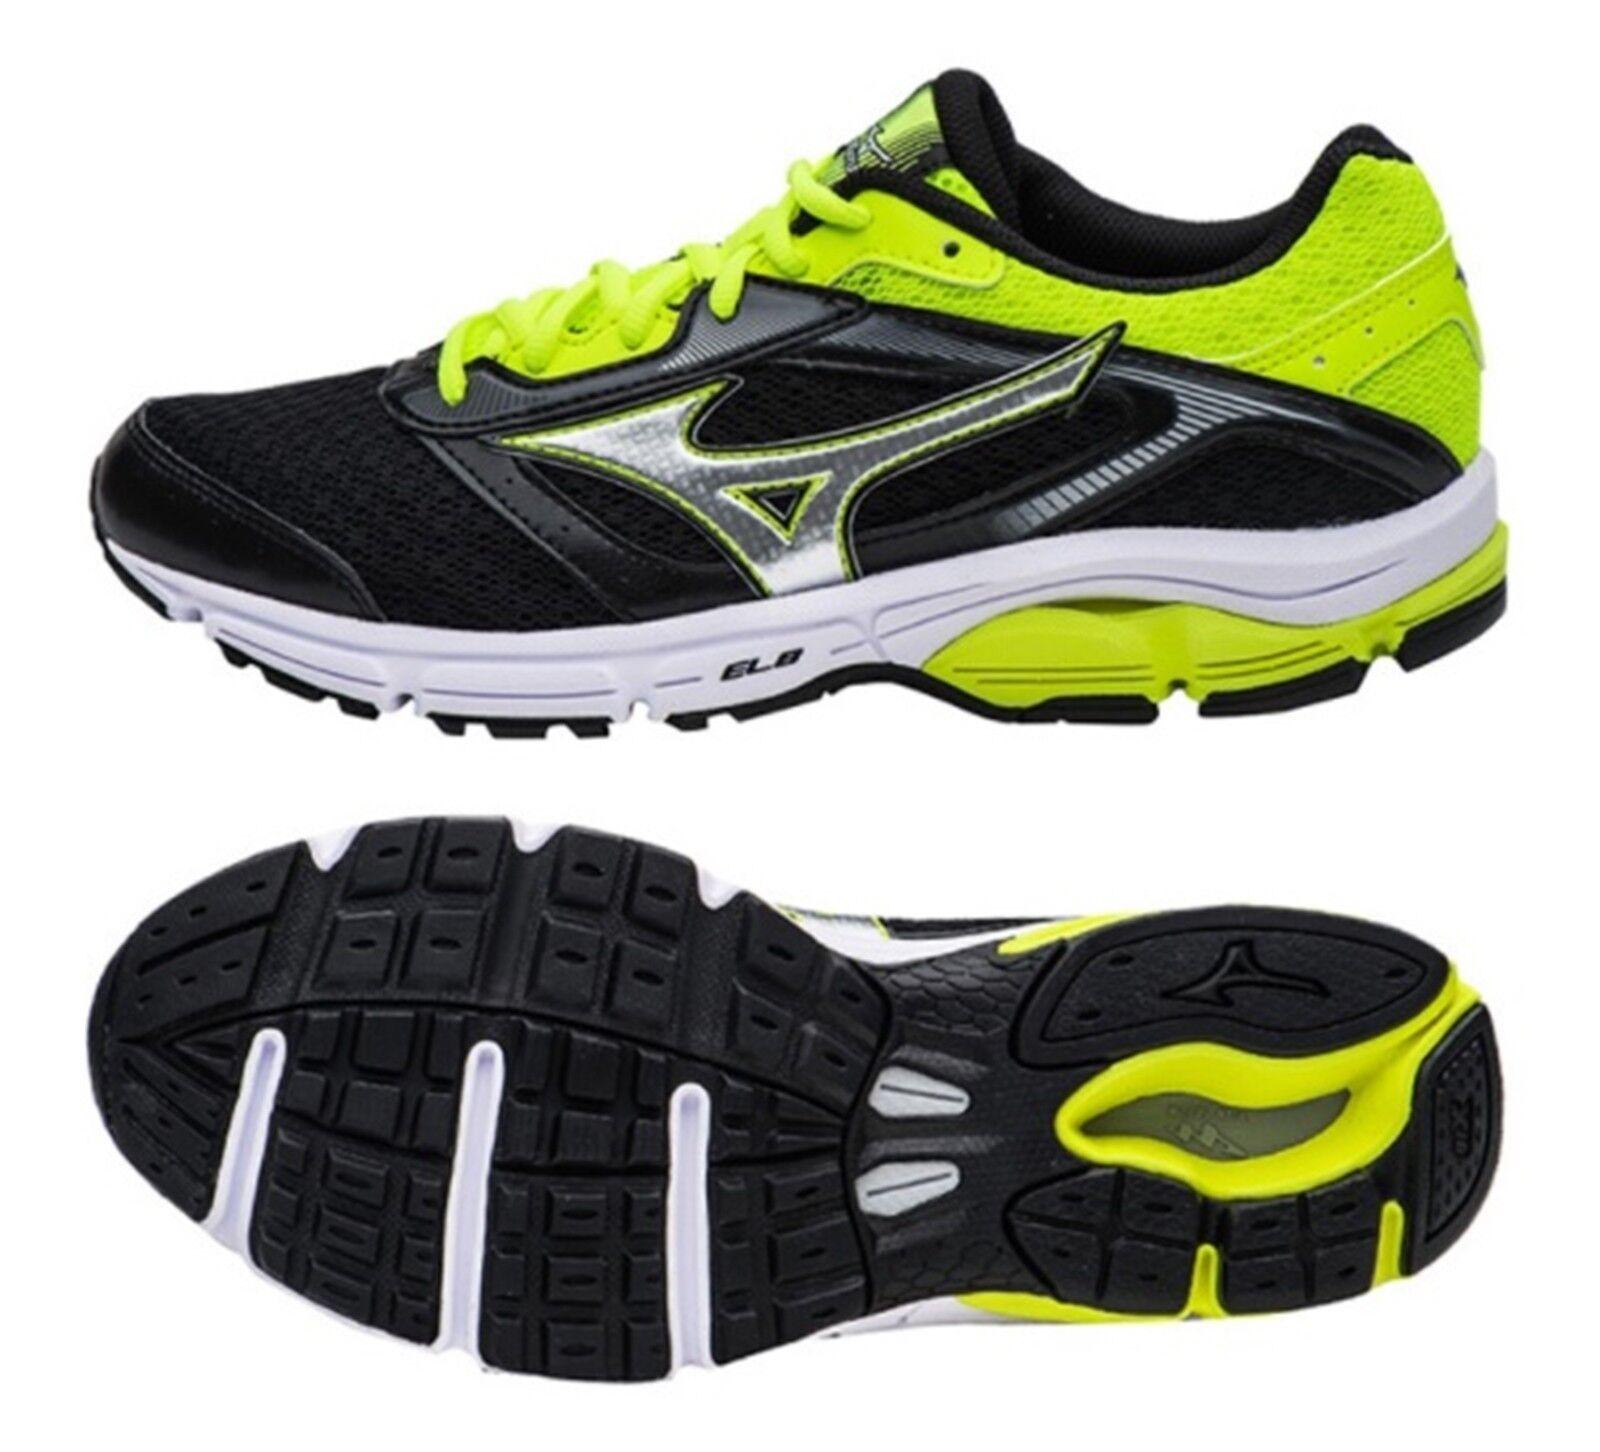 Mizuno mannen Wave IMPETUS 4 Training schoenen zwart hardlopen sportschoenen schoen J1CG161305